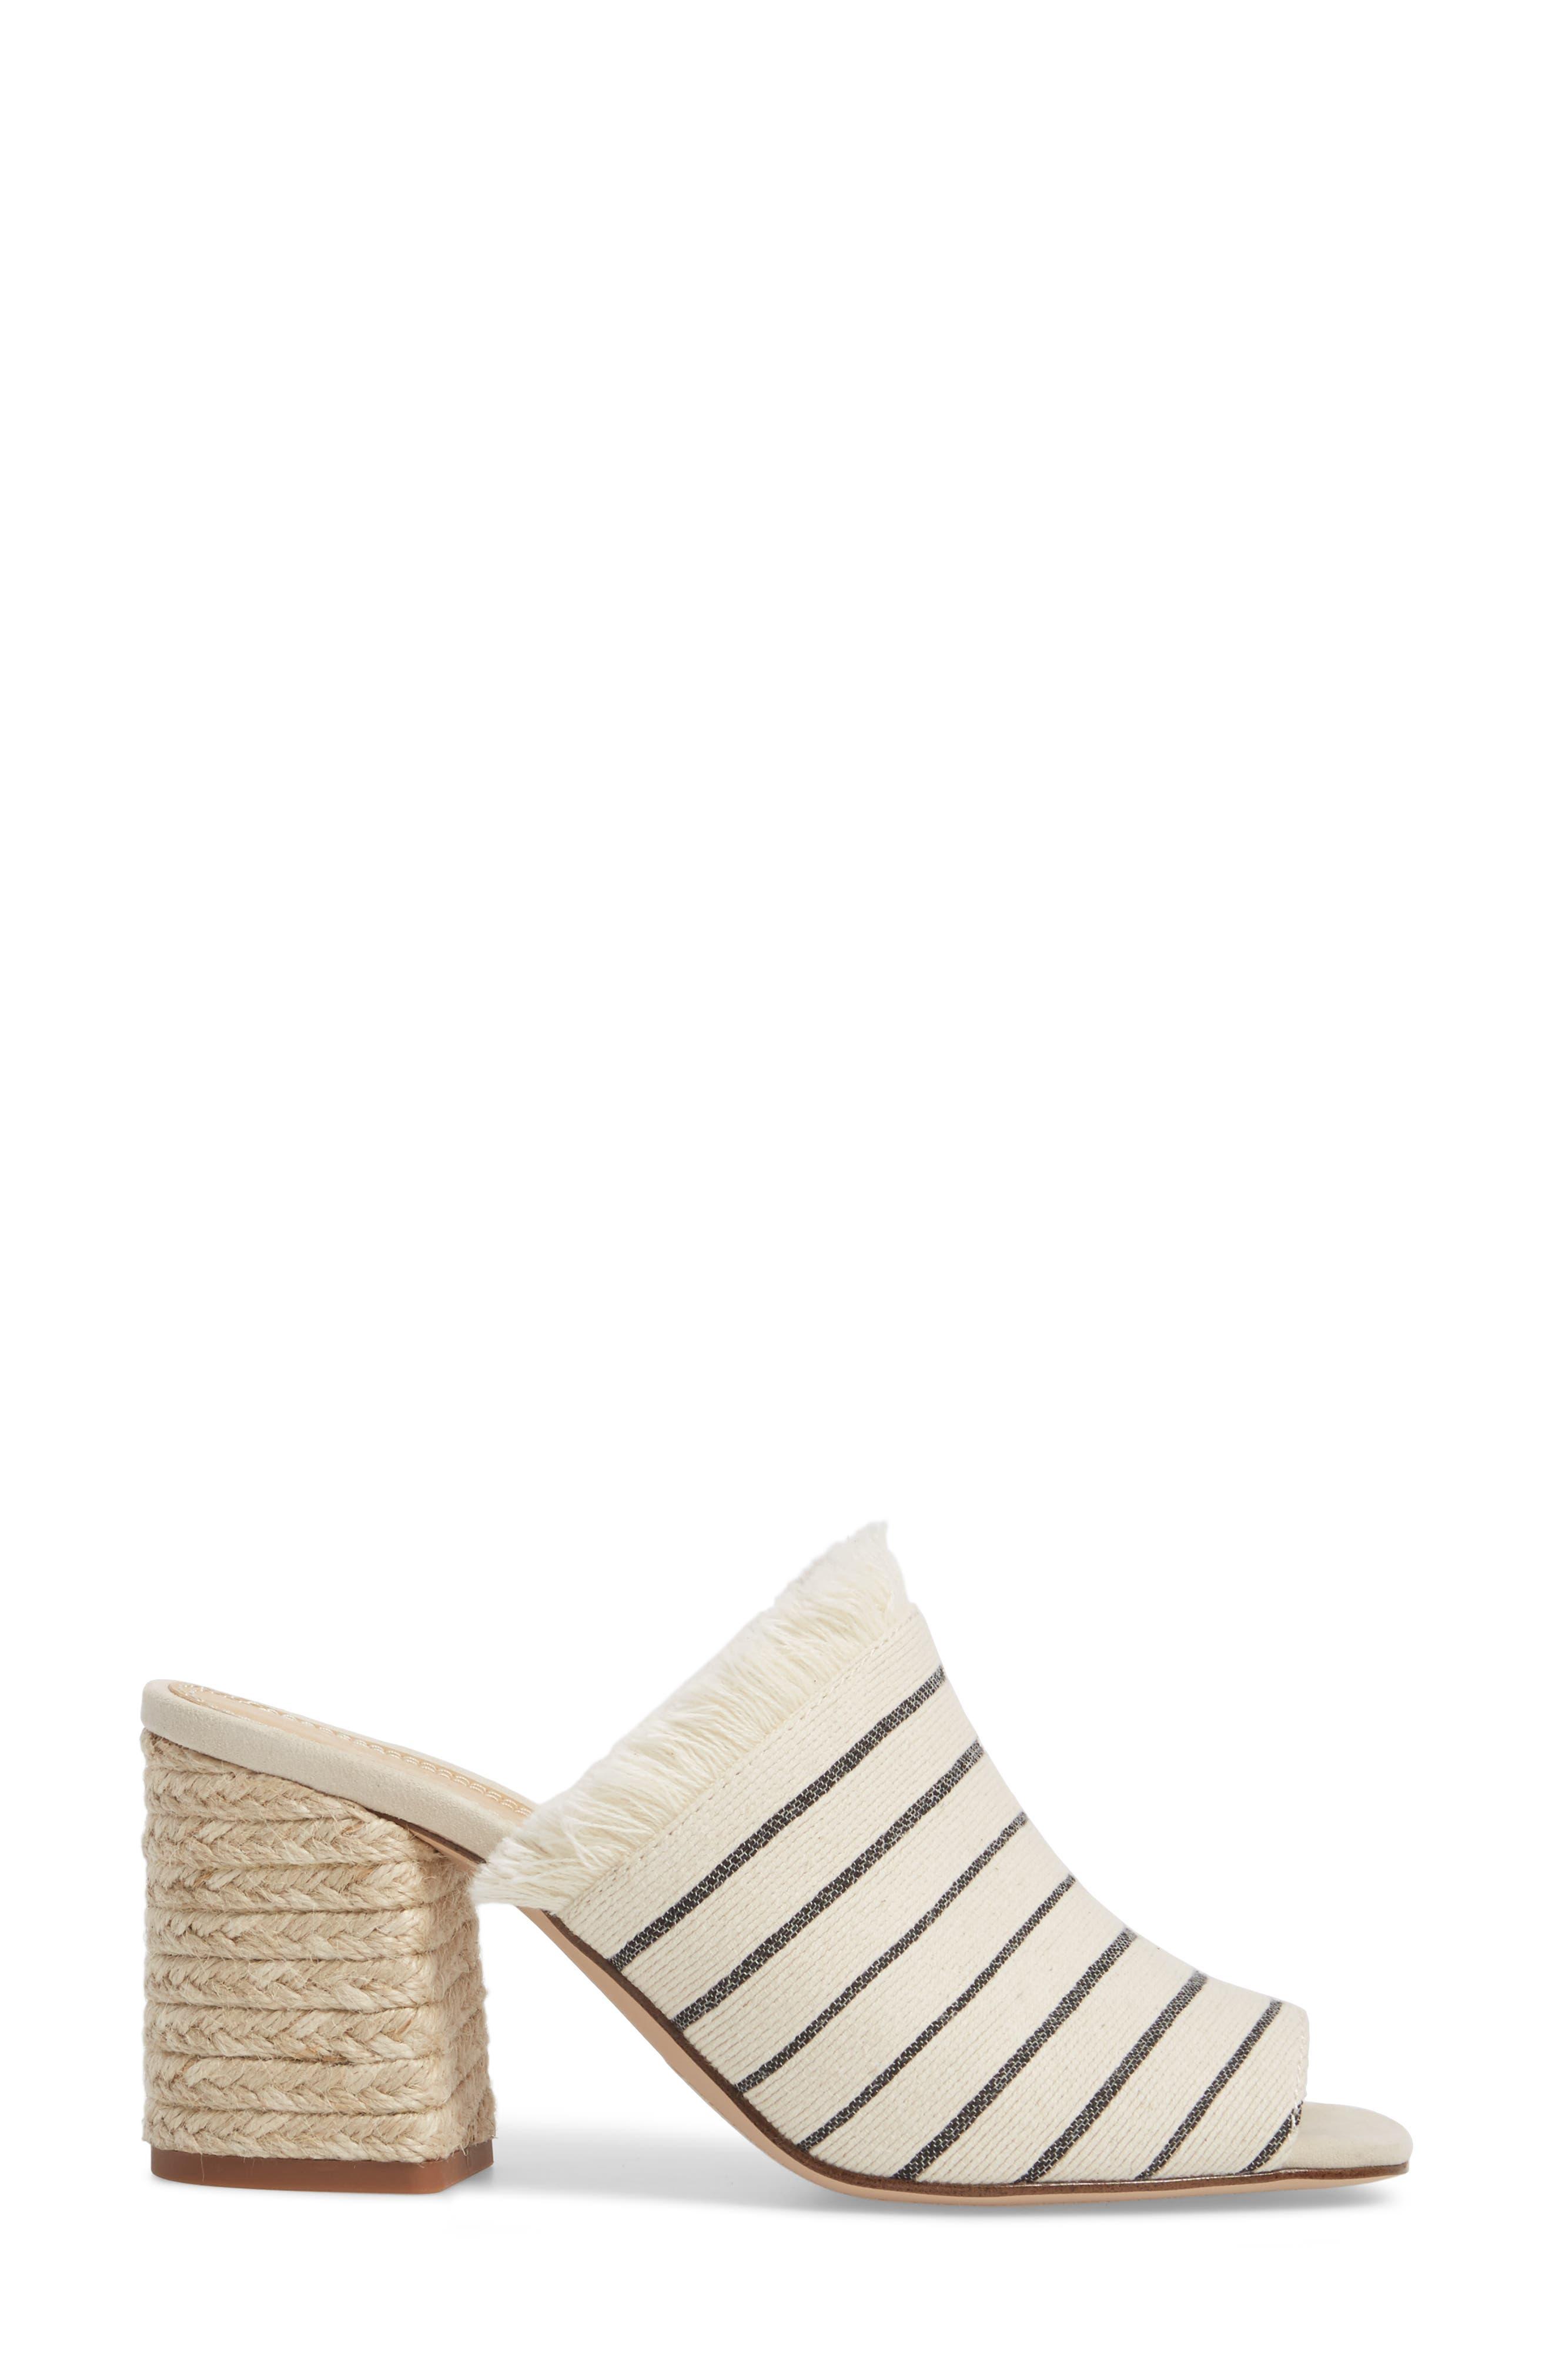 Baron Fringed Block Heel Slide,                             Alternate thumbnail 3, color,                             Cream Leather